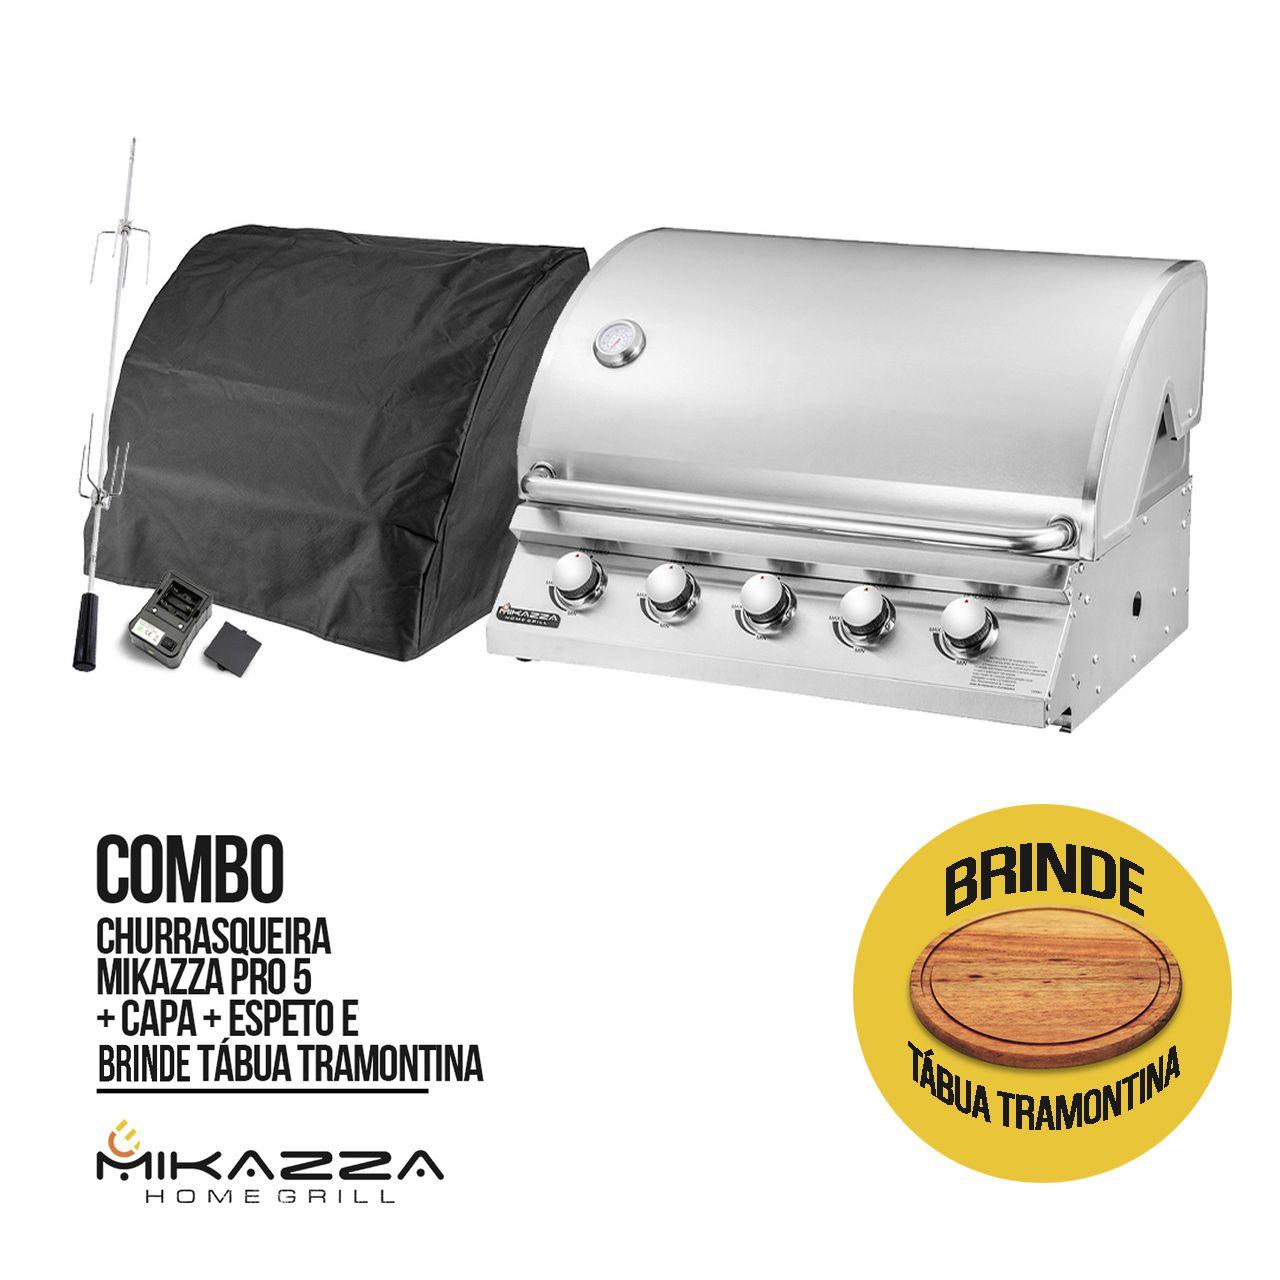 Churrasqueira à Gás Embutir Mikazza Pro 5 + Capa + Espeto + Tábua Tramontina